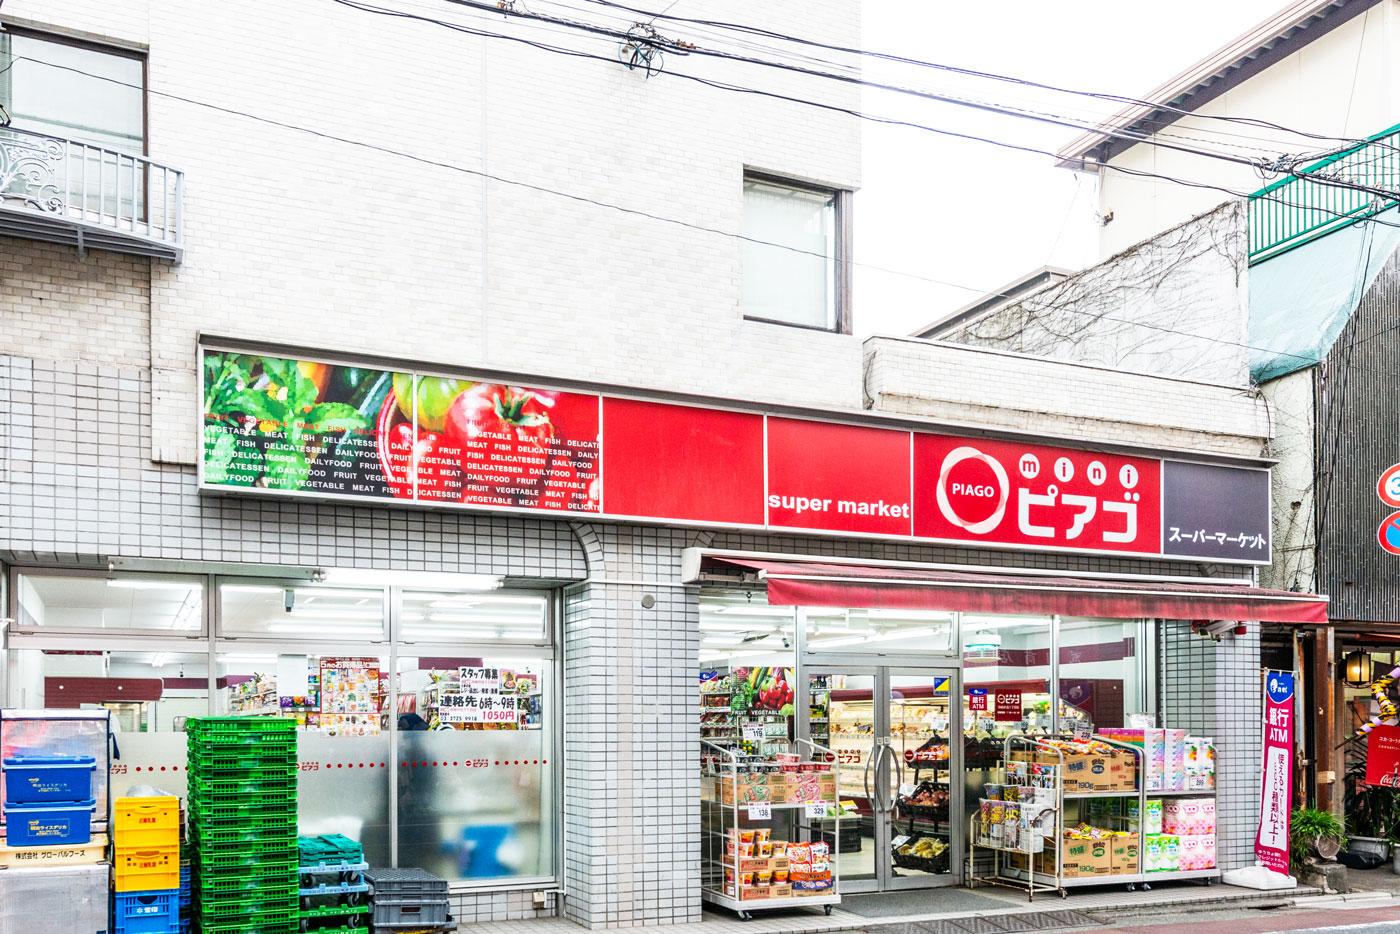 miniピアゴ自由が丘1丁目店(500m)スーパーマーケット